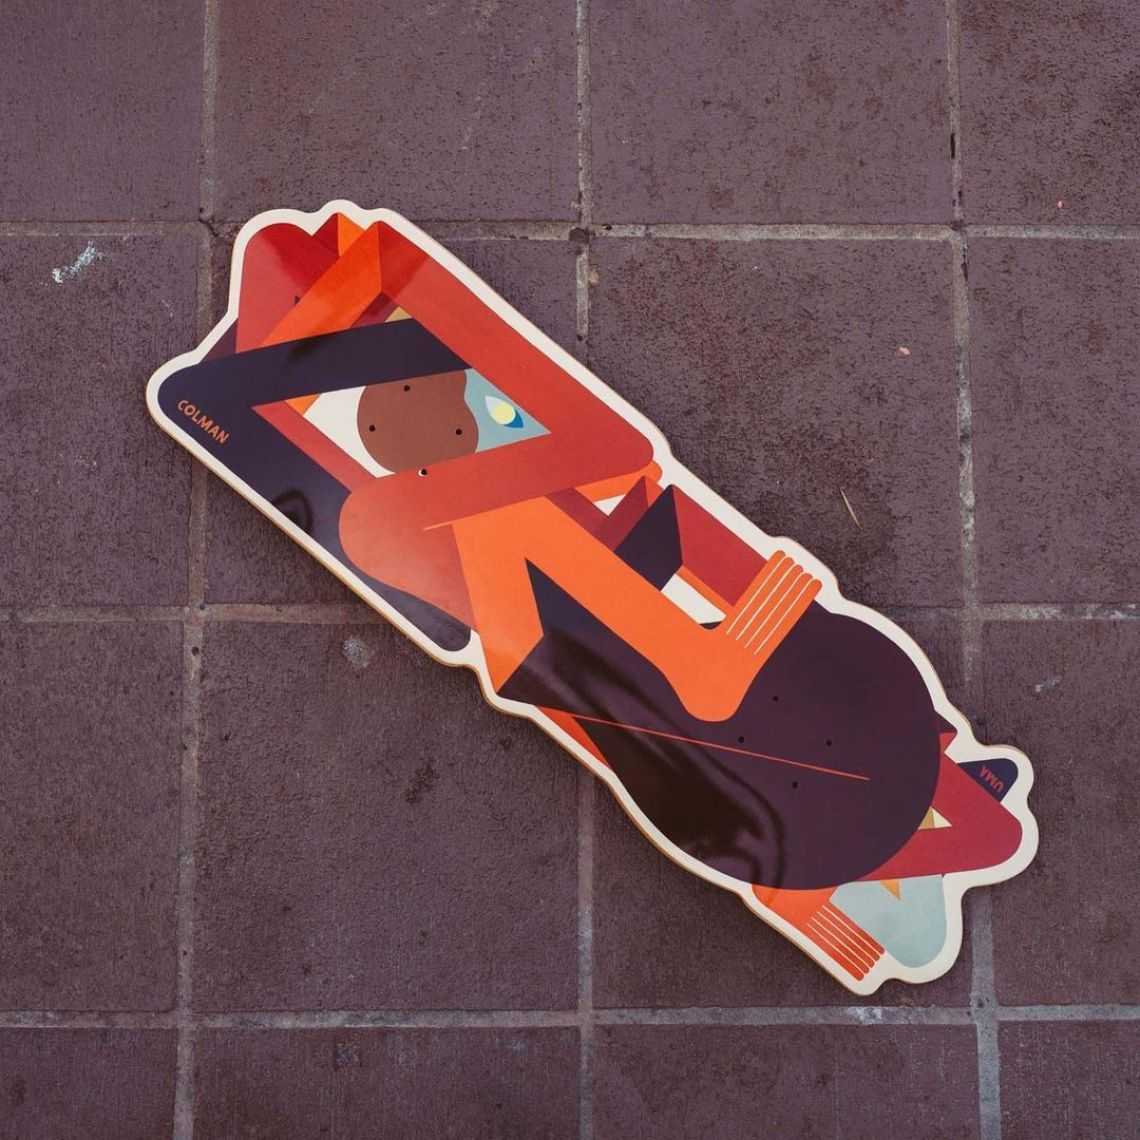 Crazy Special Edition By Richard Colman X Uma Skateboards 2